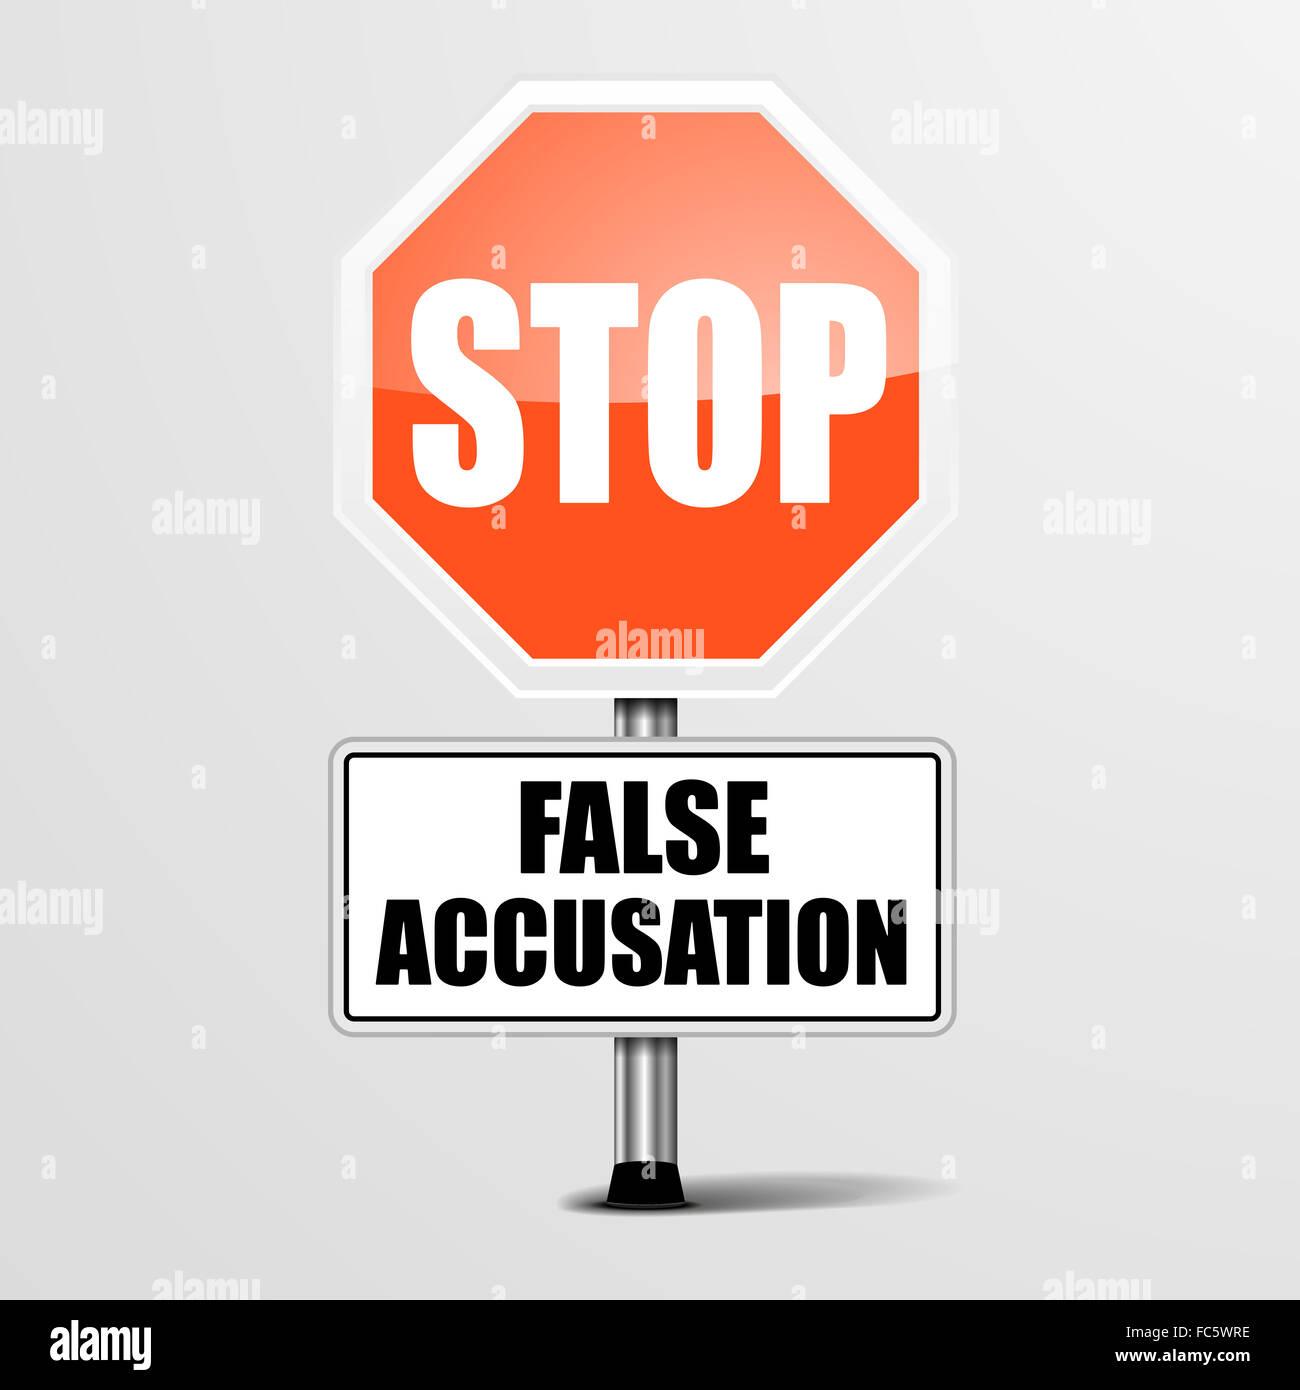 Stop False Accusation - Stock Image